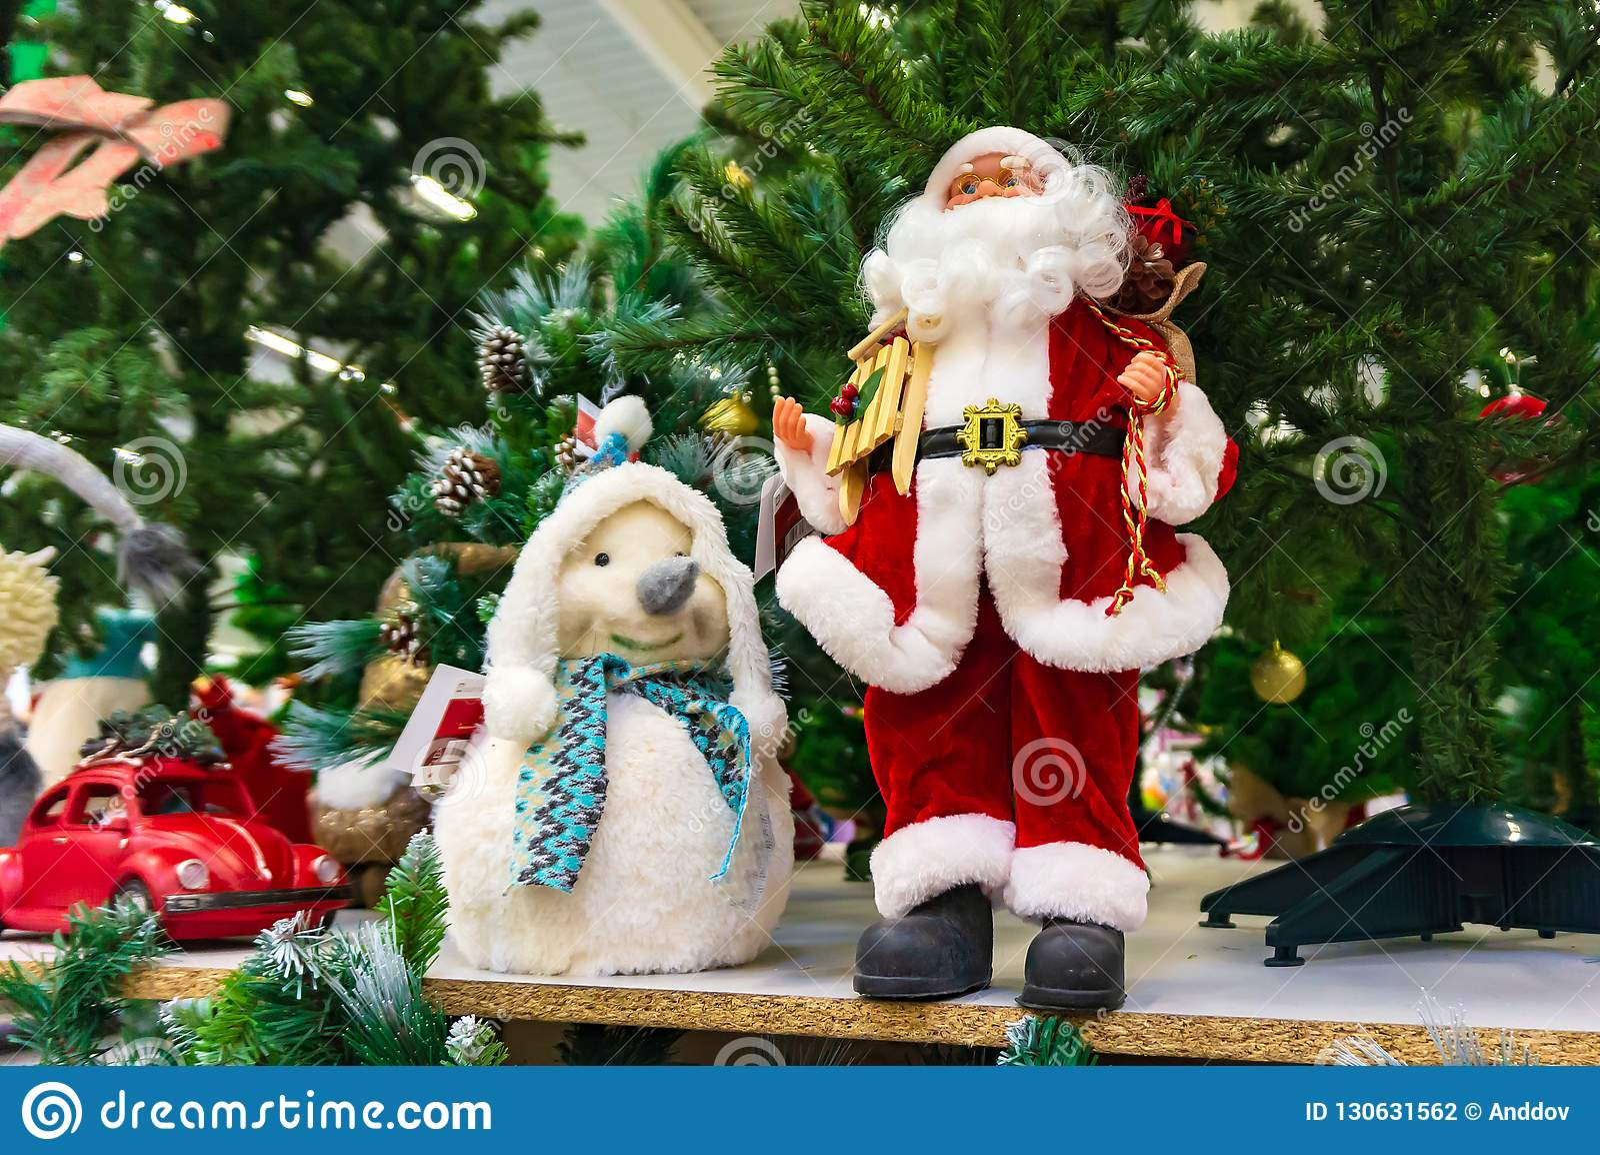 Kerstmisstuk speelgoed, het Sneeuwmeisje naast Santa Claus